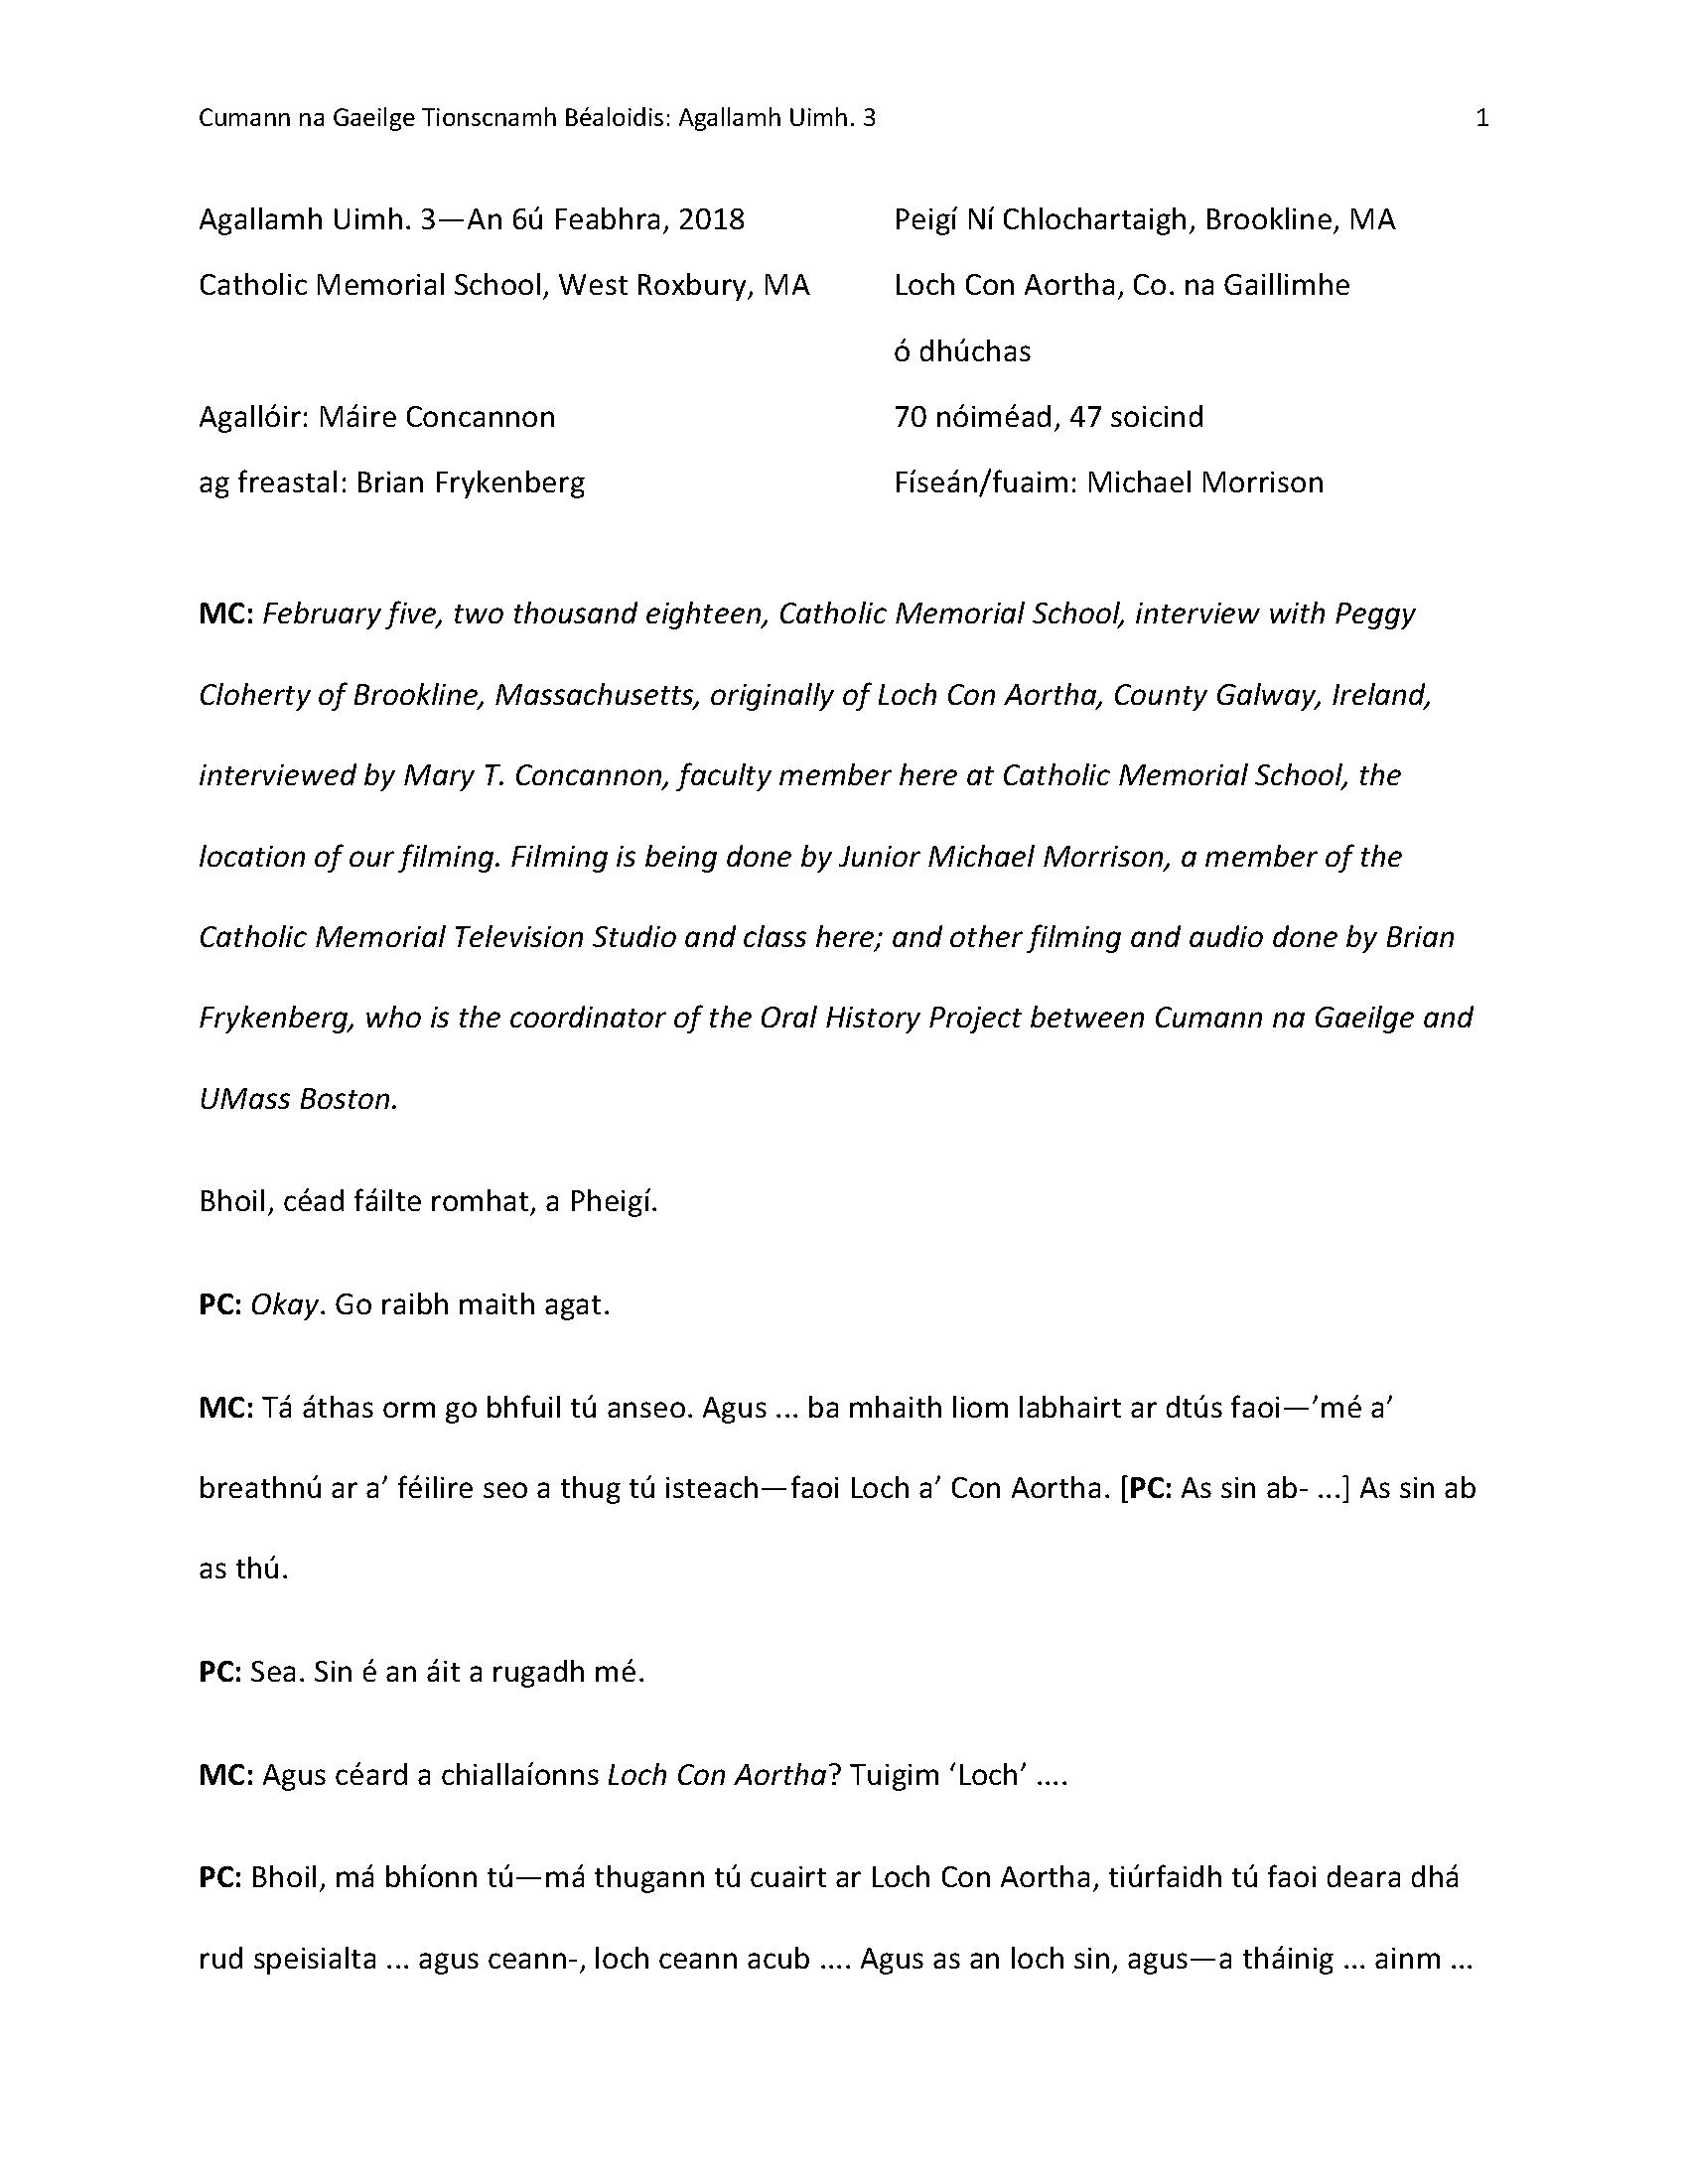 Irish transcription of interview with Peggy Cloherty (PDF